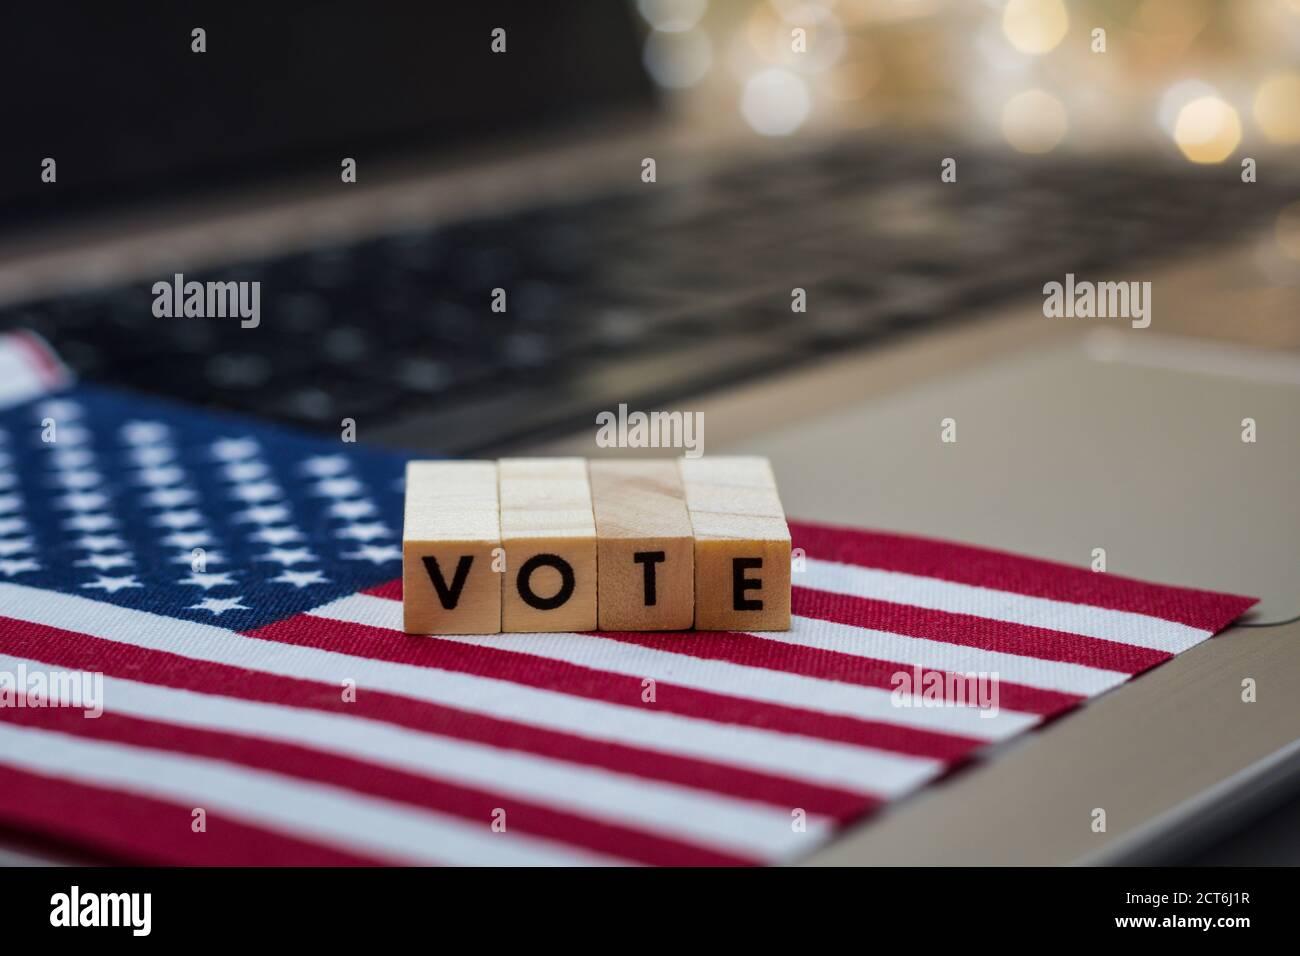 VOTE letter blocks concept on laptop keyboard Stock Photo